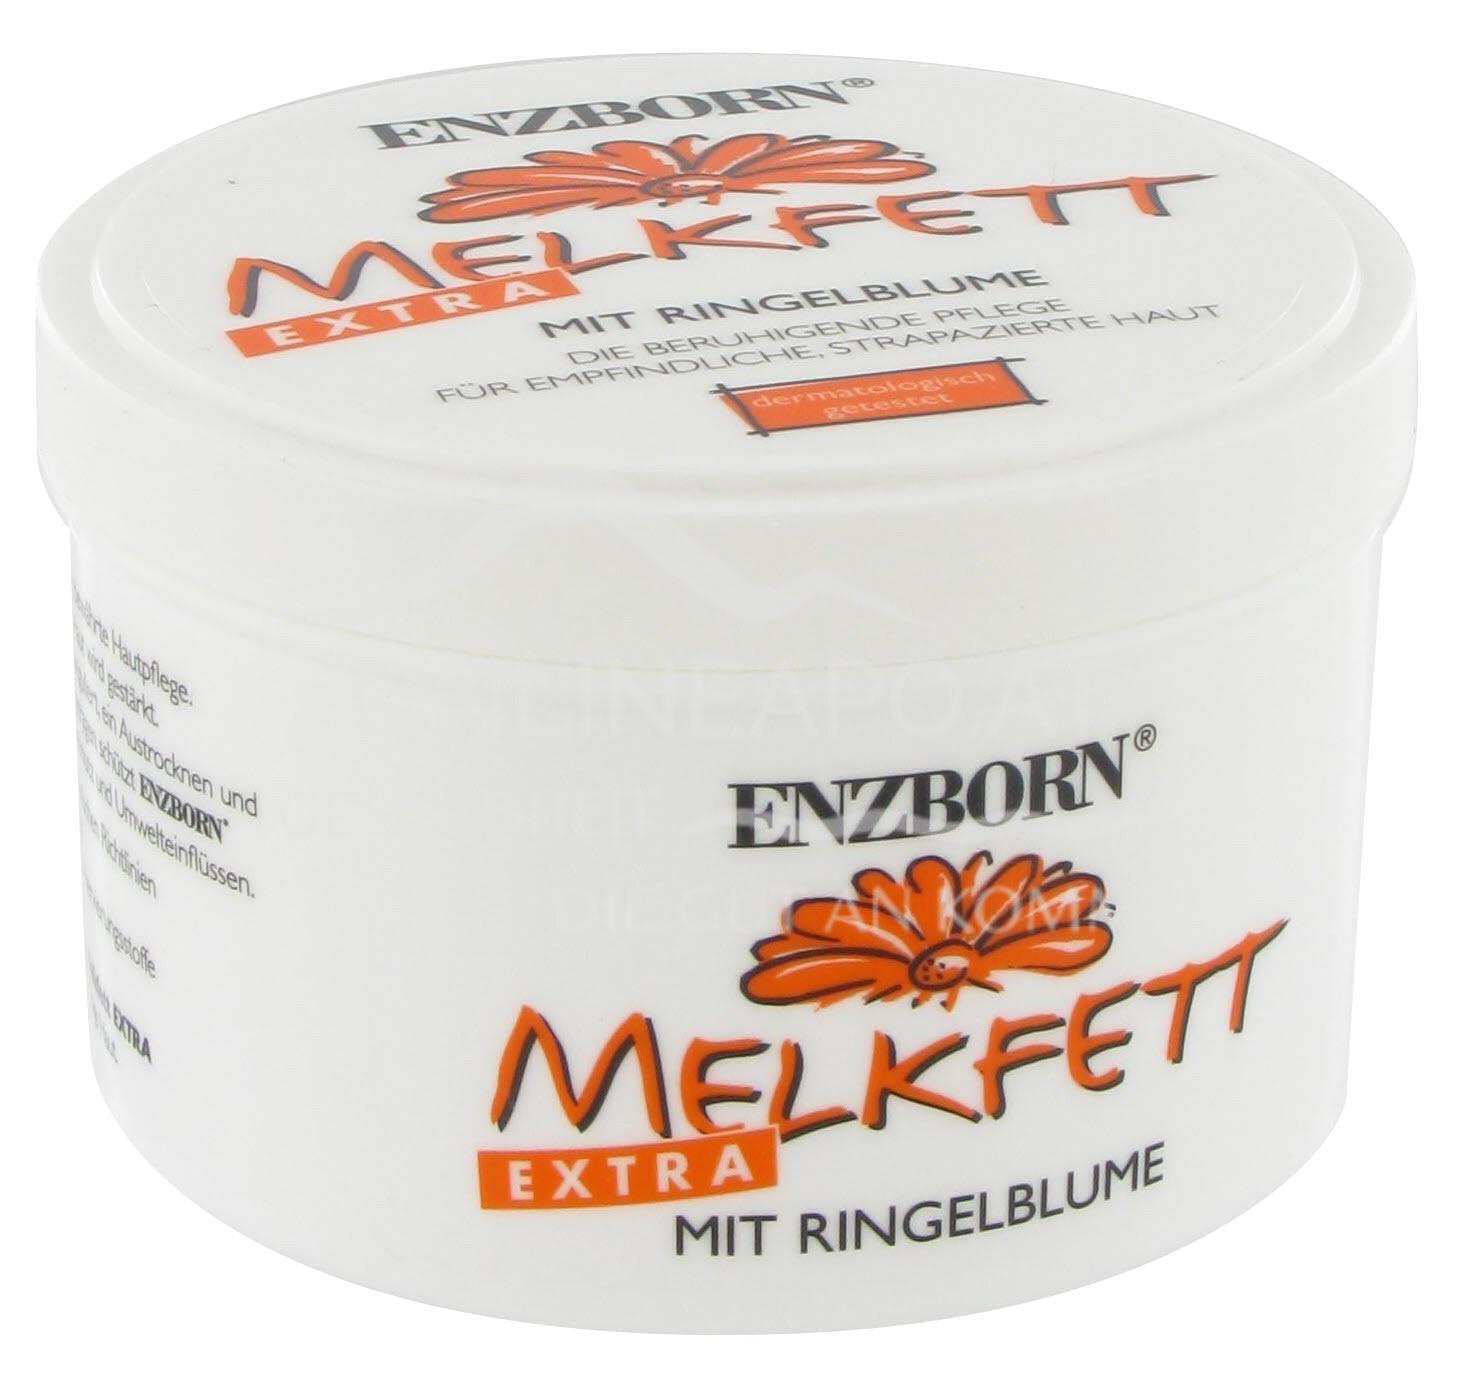 Enzborn Melkfett EXTRA mit Ringelblume